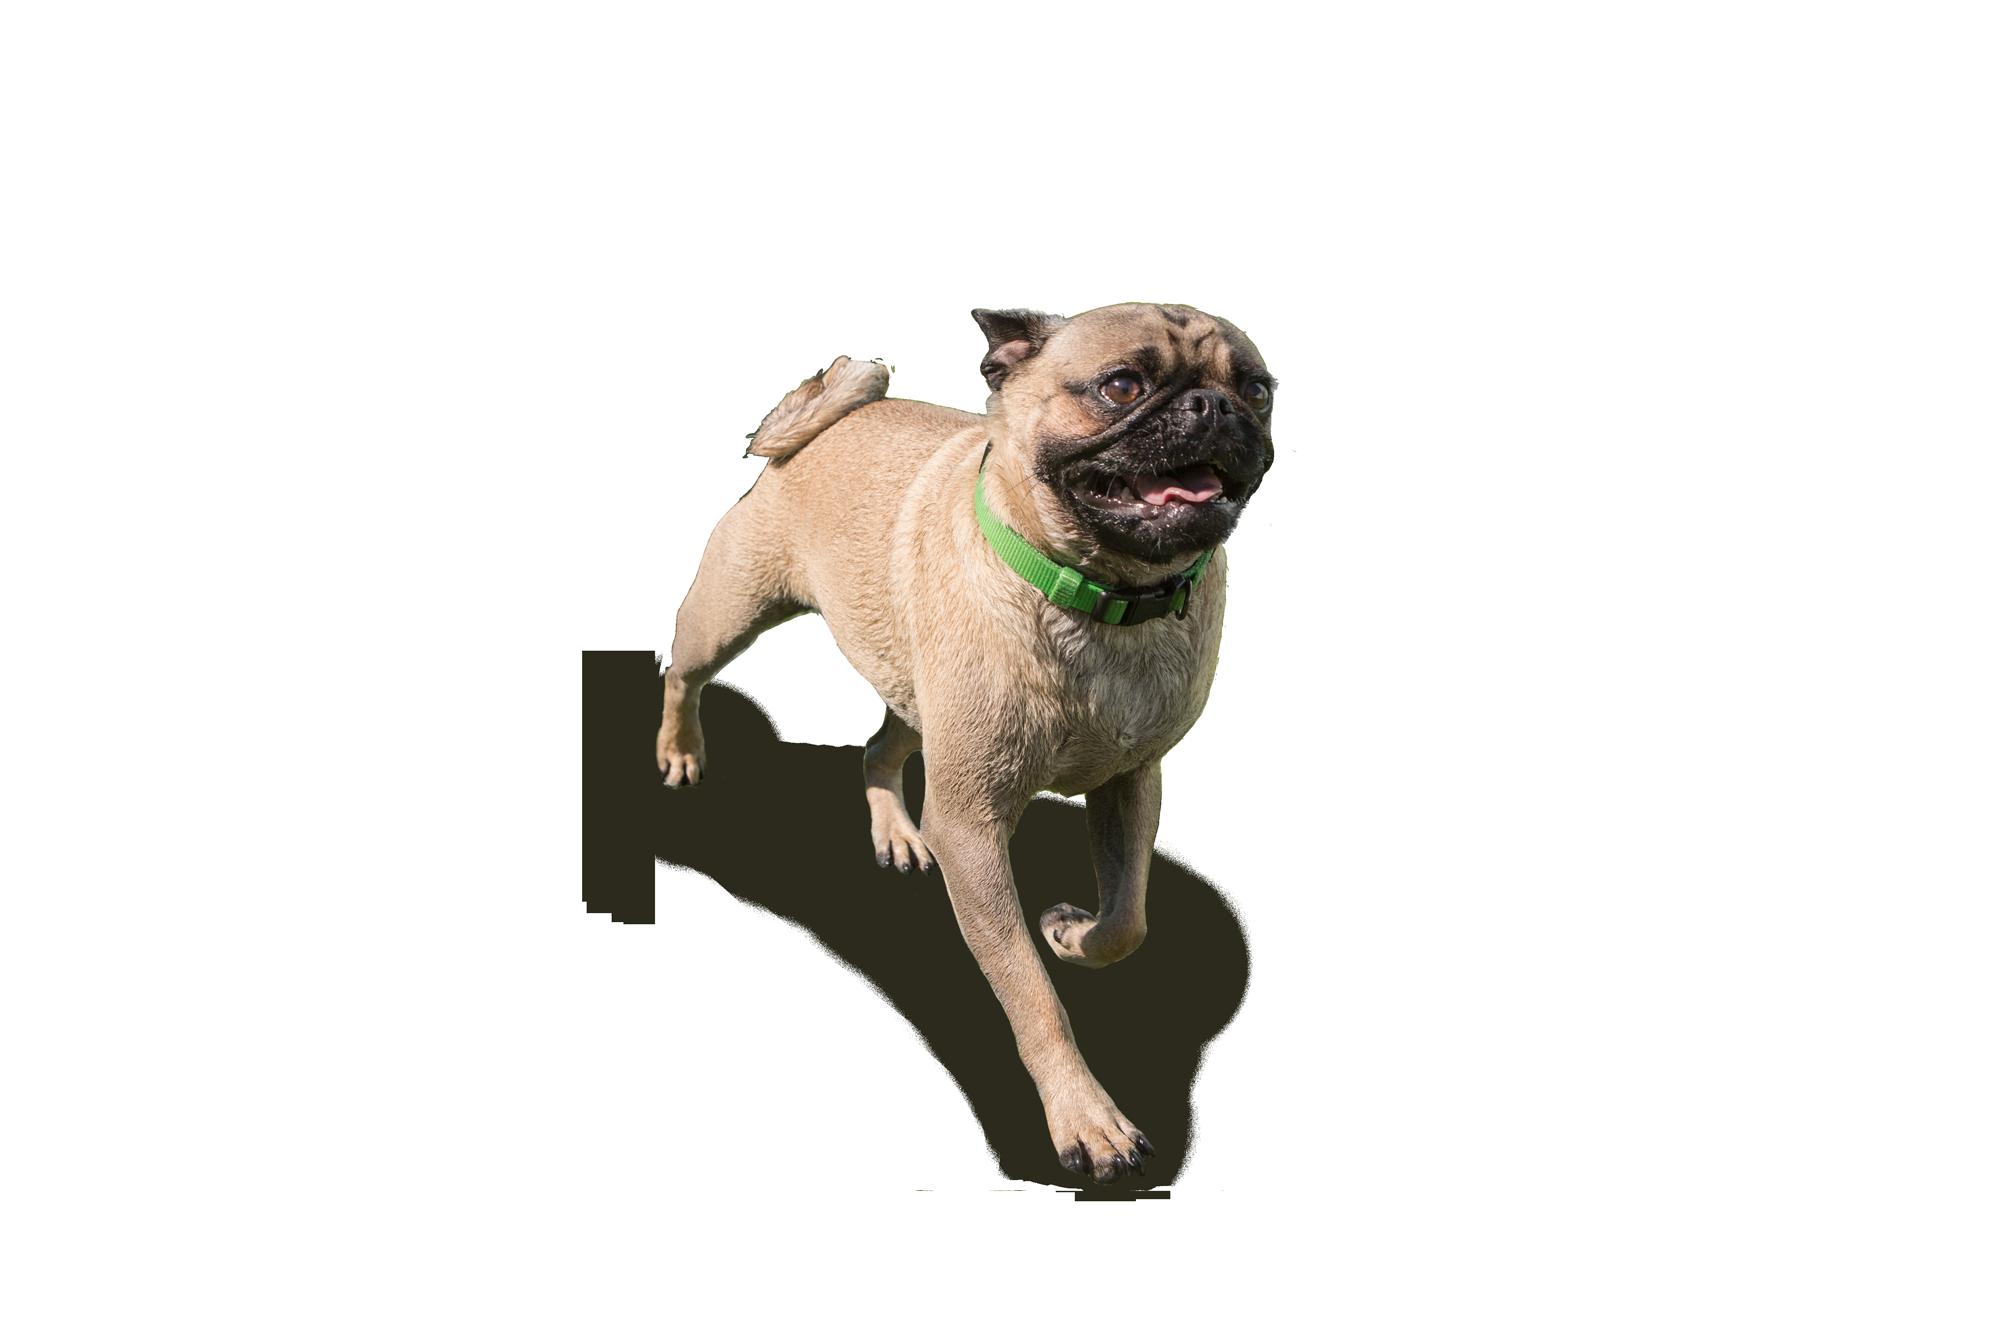 Happy pug dog cutout trotting